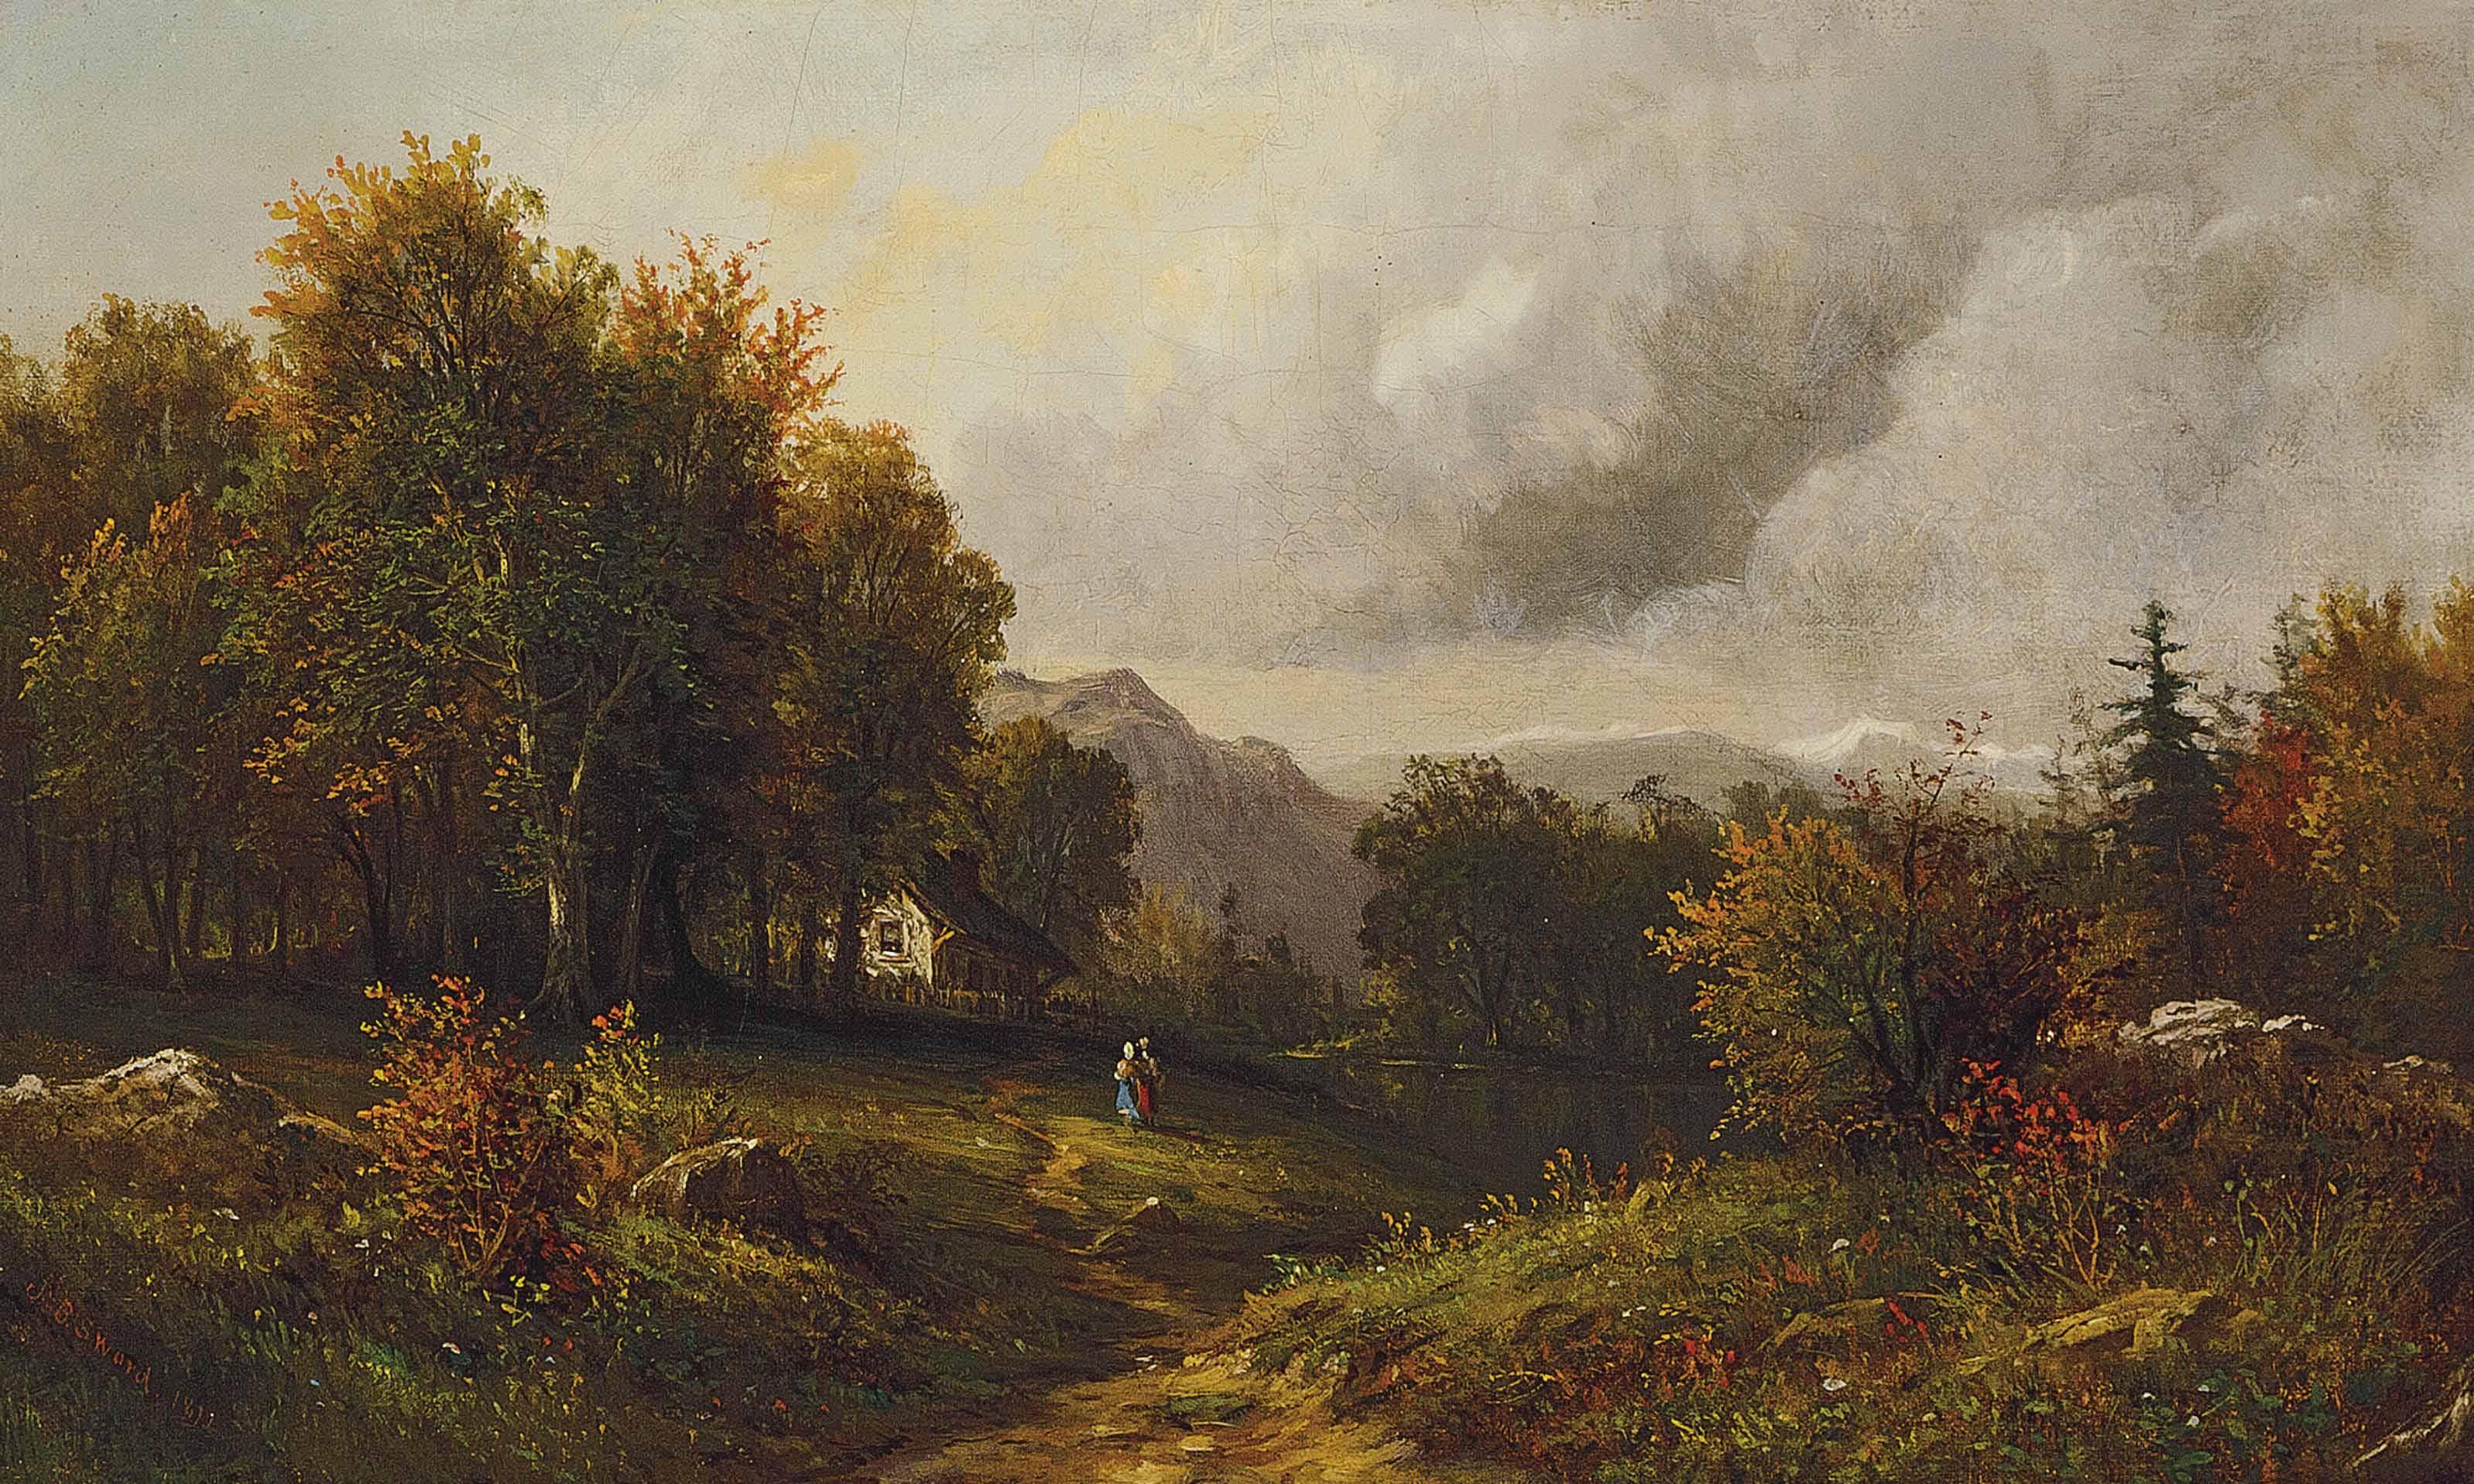 Landscape in the Poconos